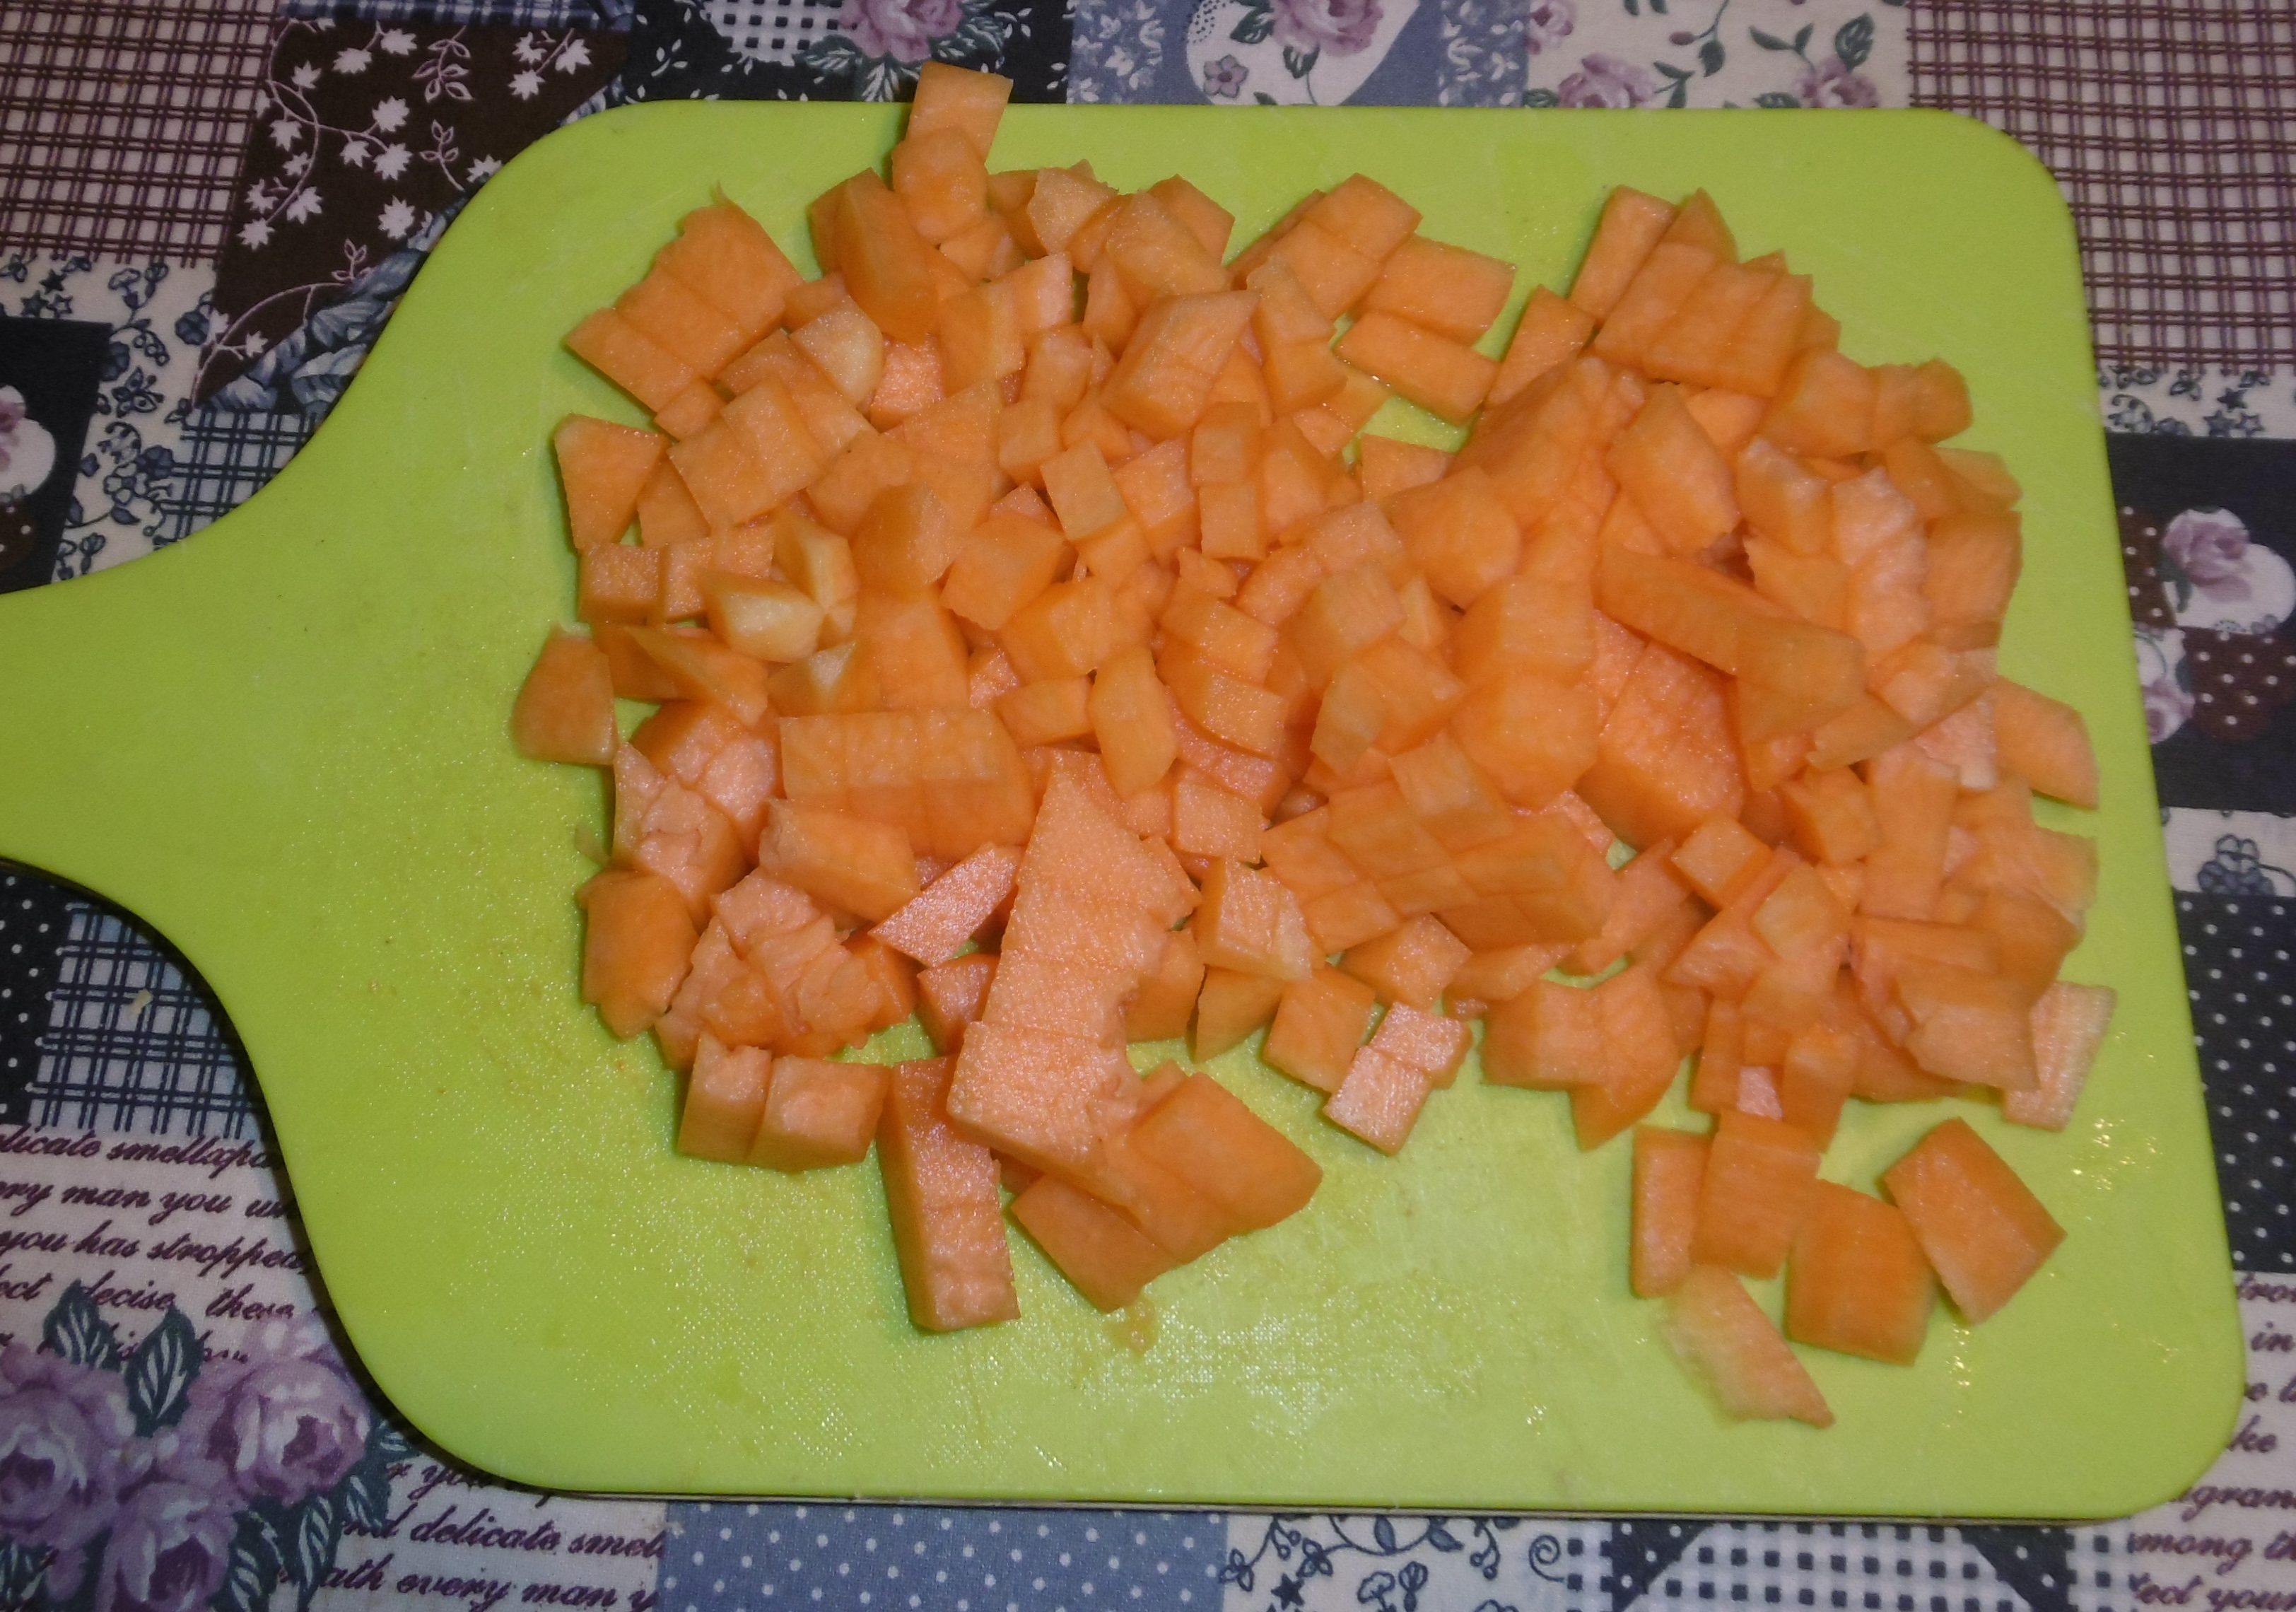 Gnocchi con zucca e salsiccia - Zucca tagliata